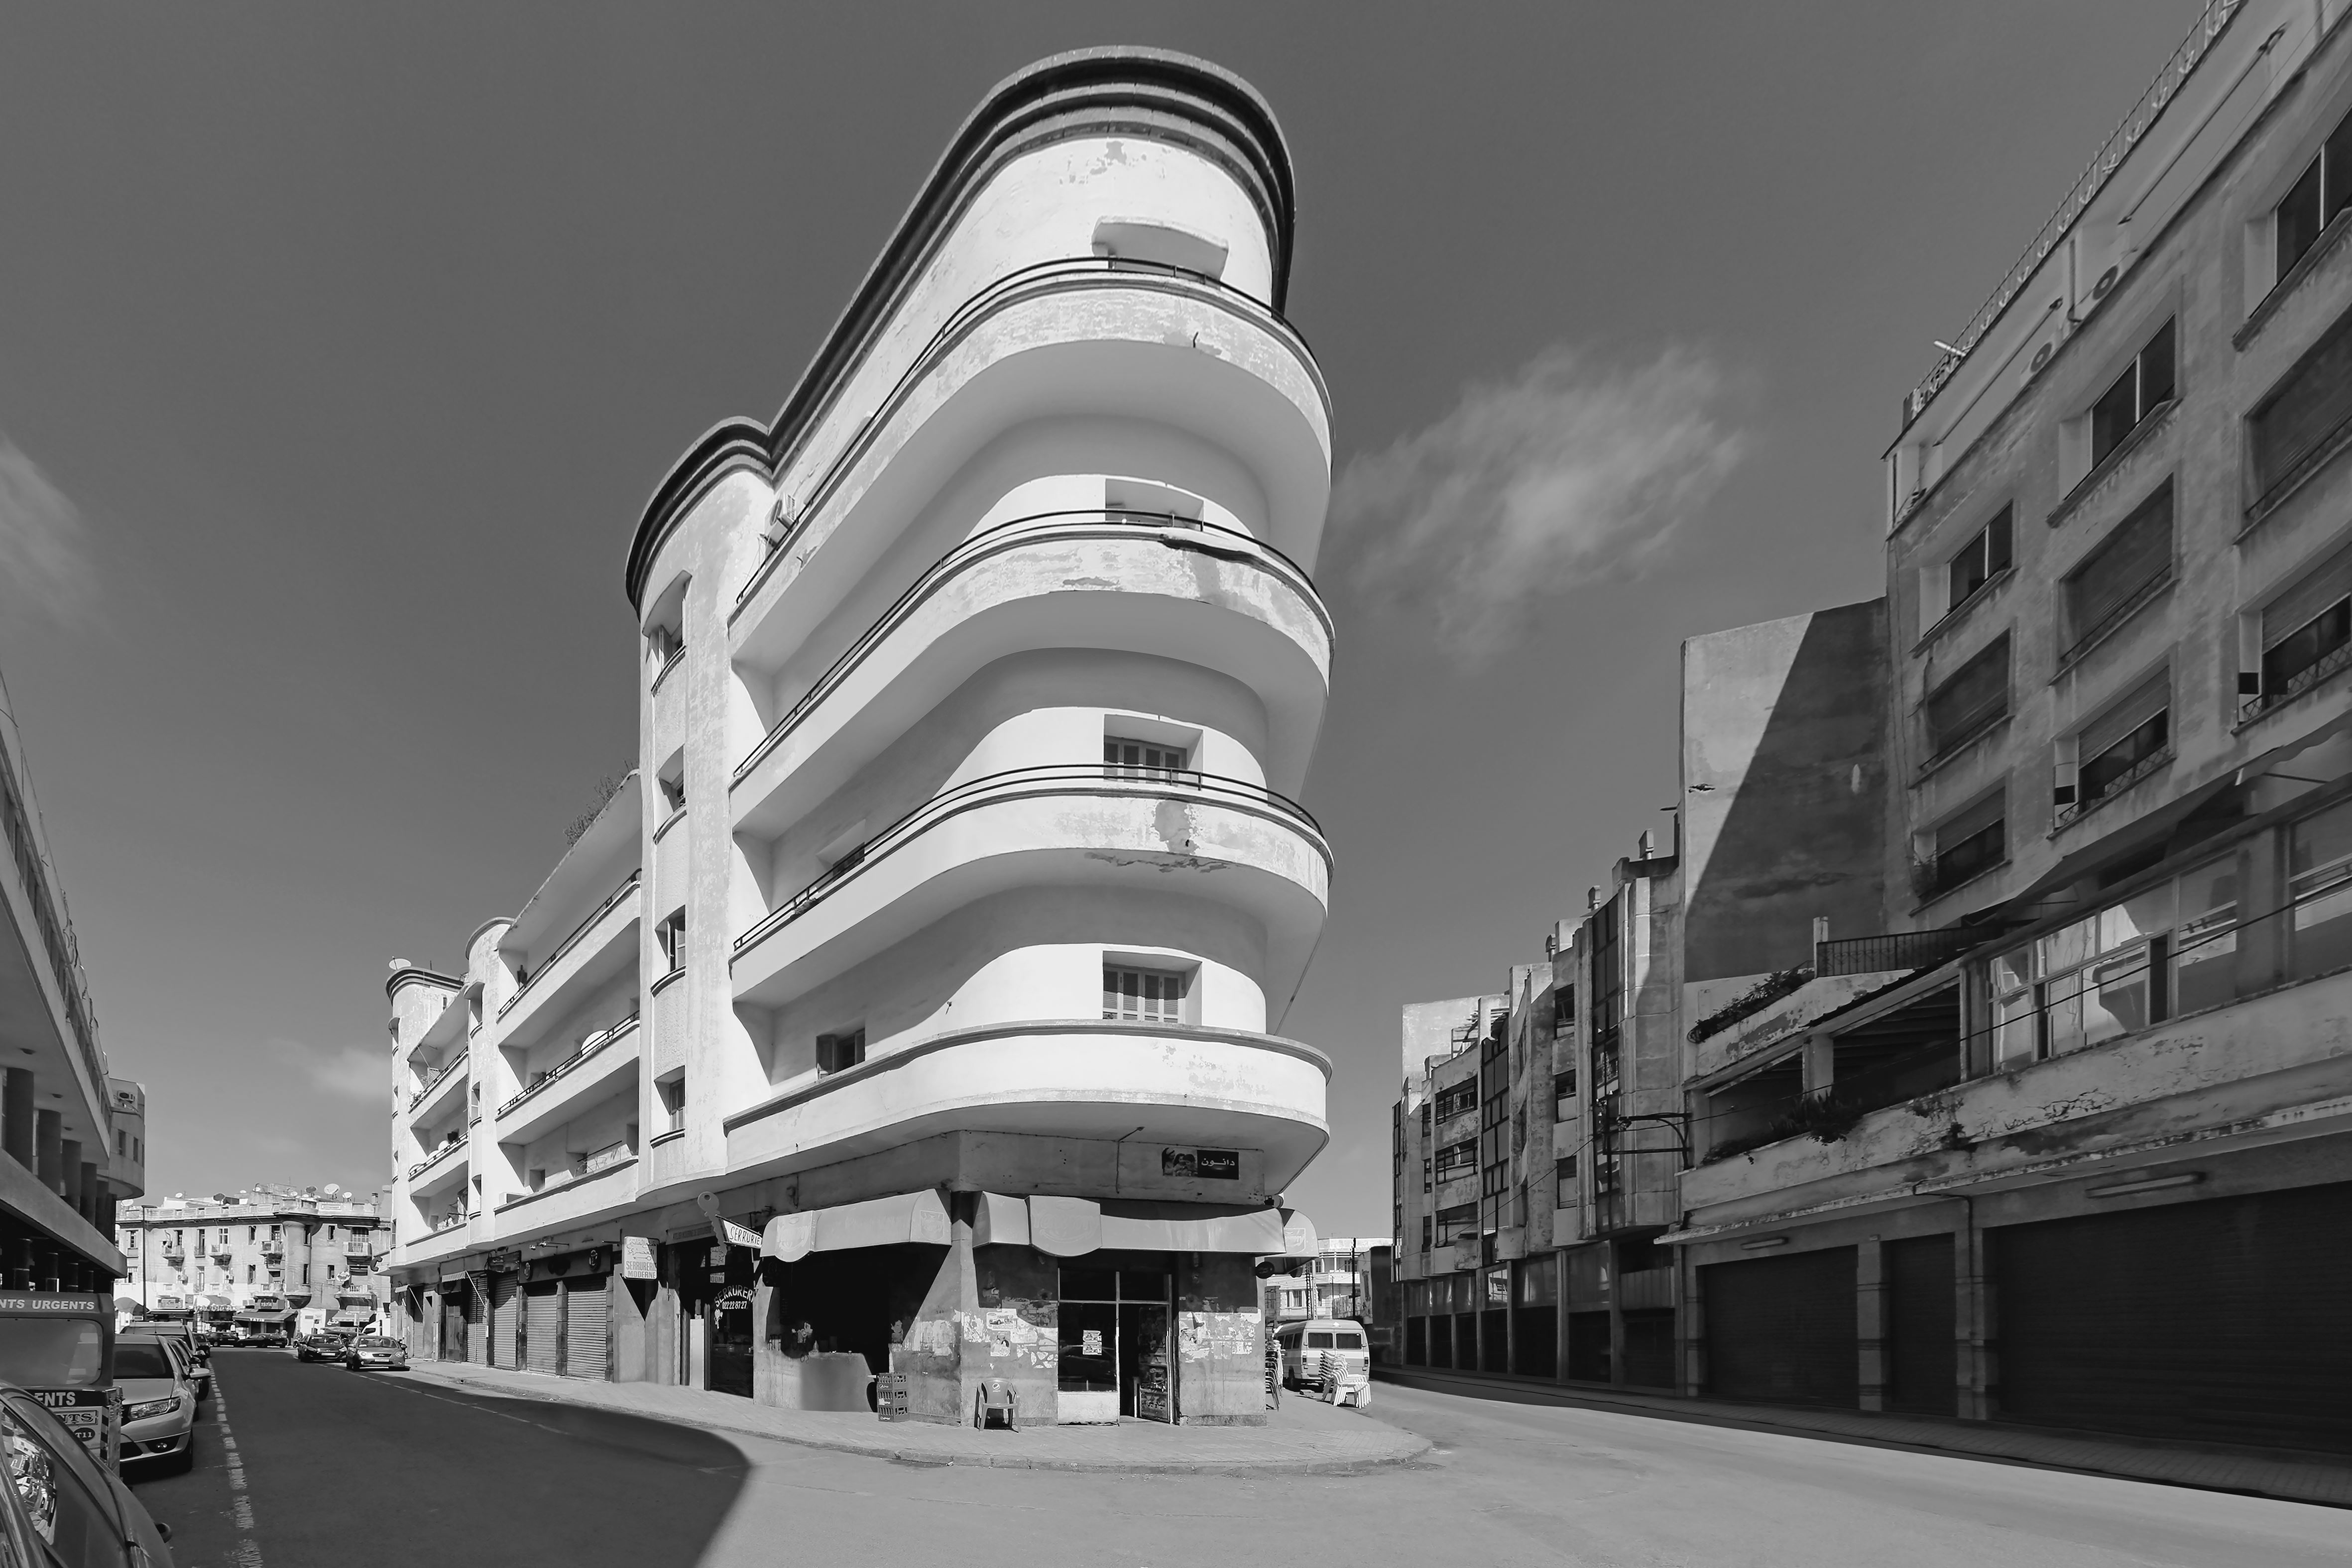 Wohnhaus Salomon Benalal, © Jean Molitor, Marokko, Casablanca, 1931, Joseph und Elias Suraqui